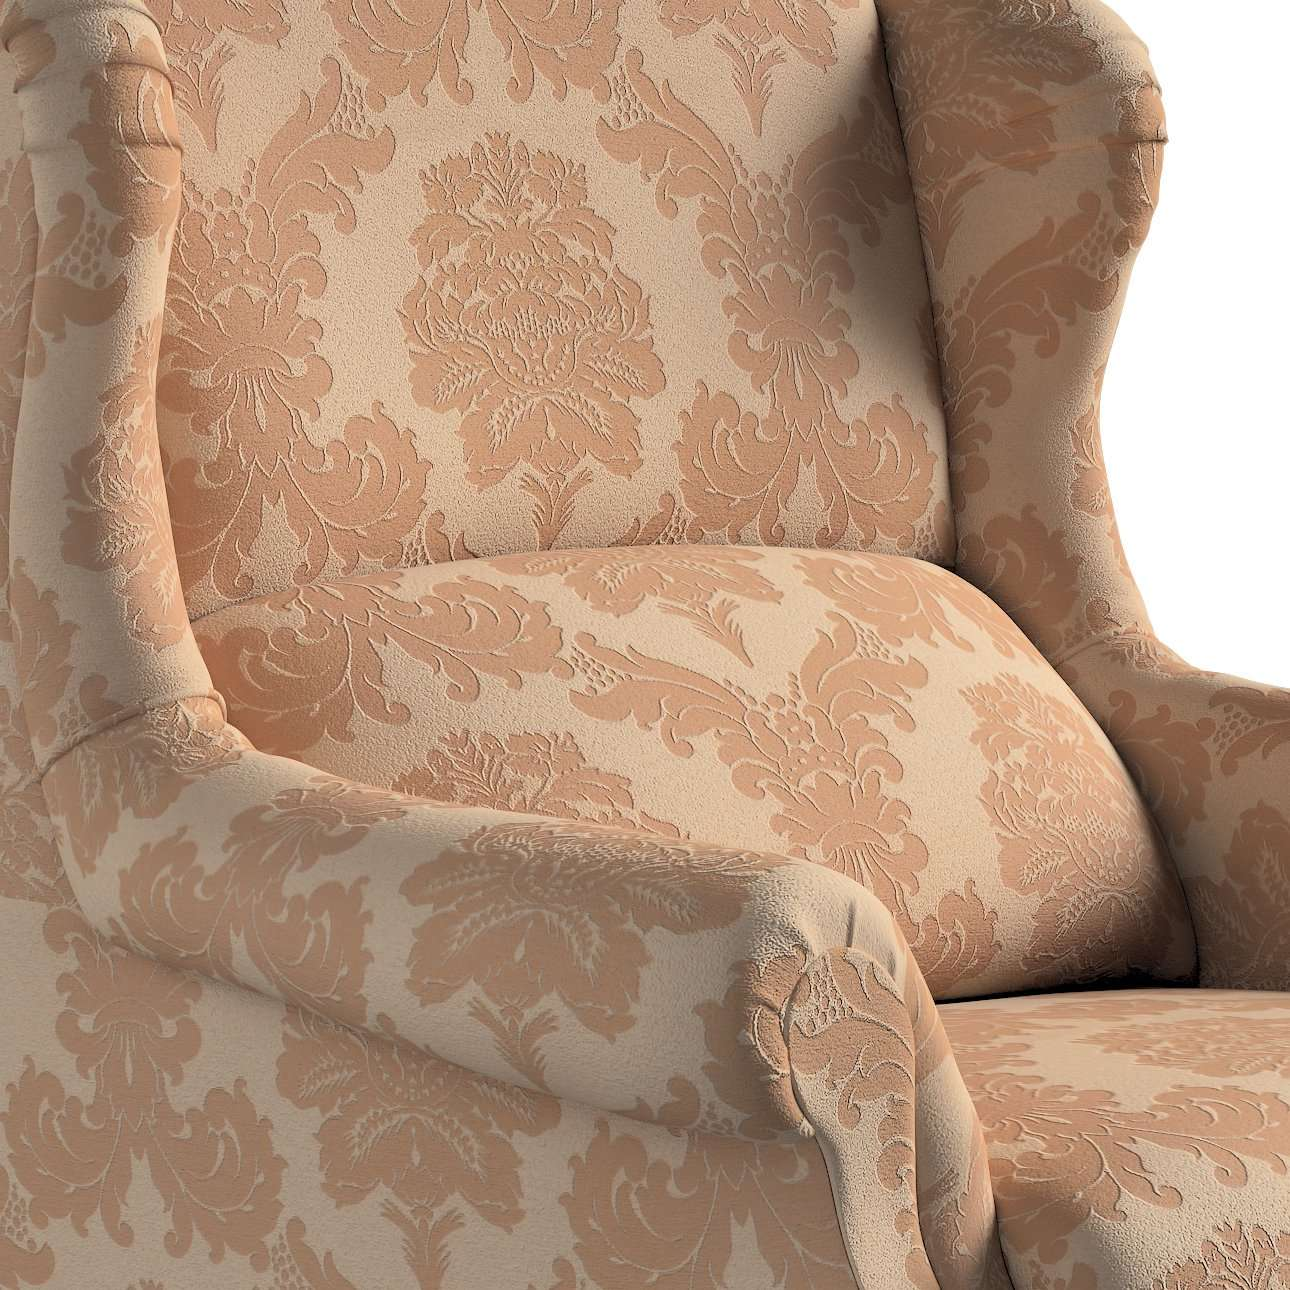 Stilingas Dekoria fotelis 63 x 115 cm kolekcijoje Damasco, audinys: 613-04